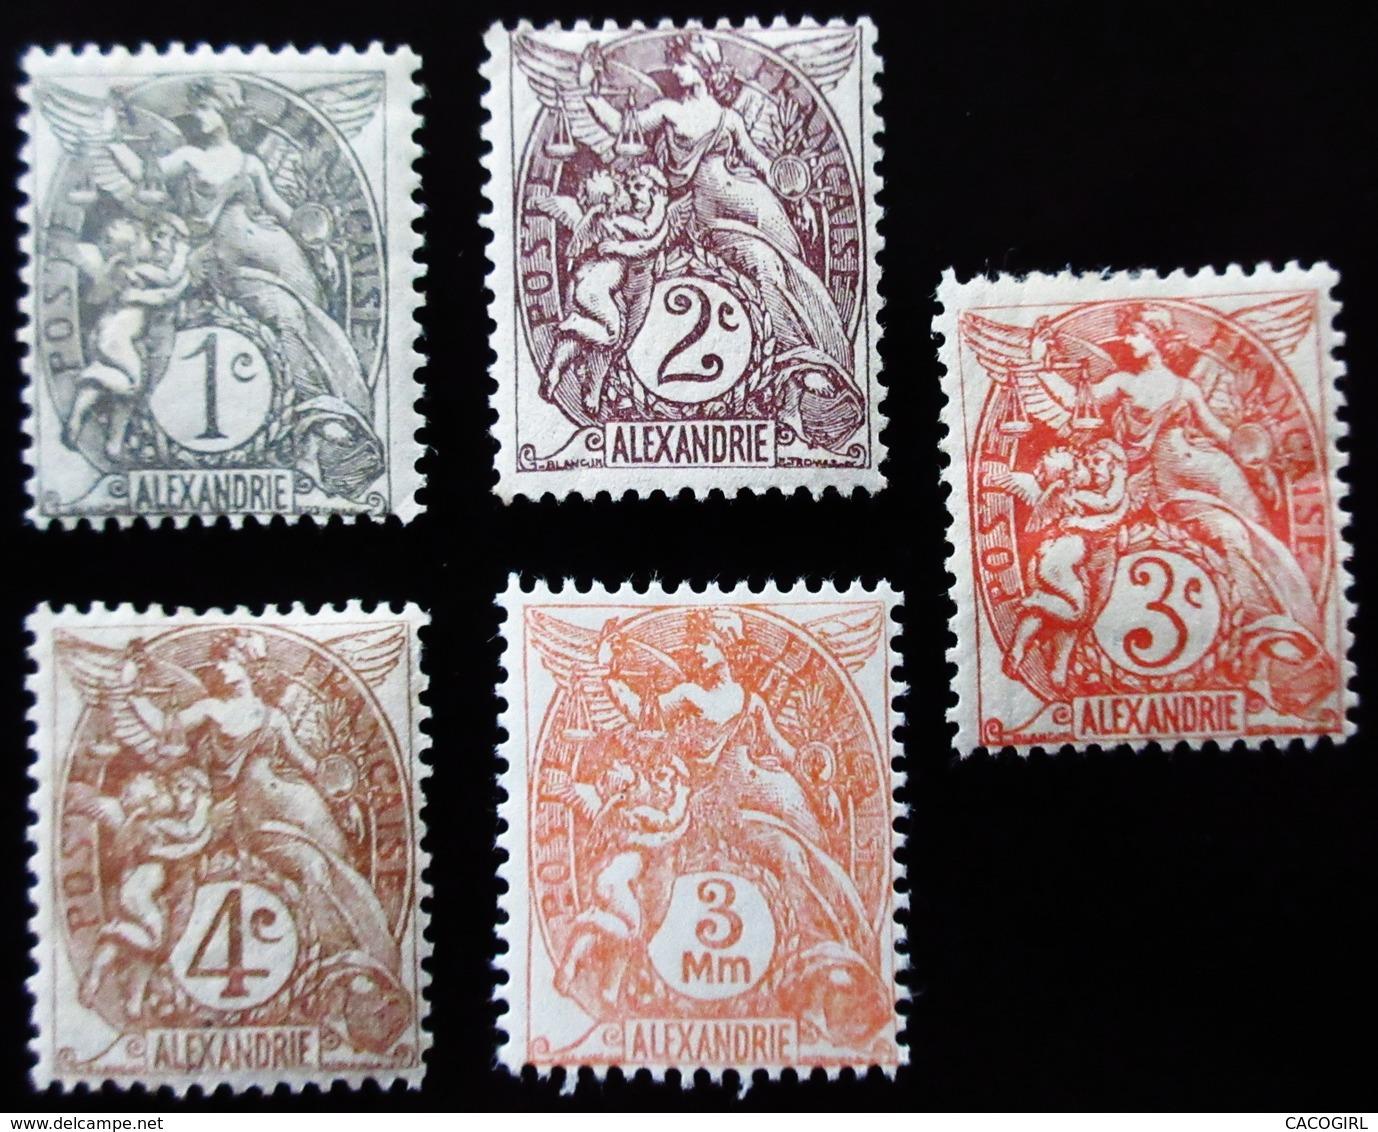 1902 Alexandrie Yt 19, 20, 21, 22, Type Blanc . Neufs Traces Charnières - Neufs